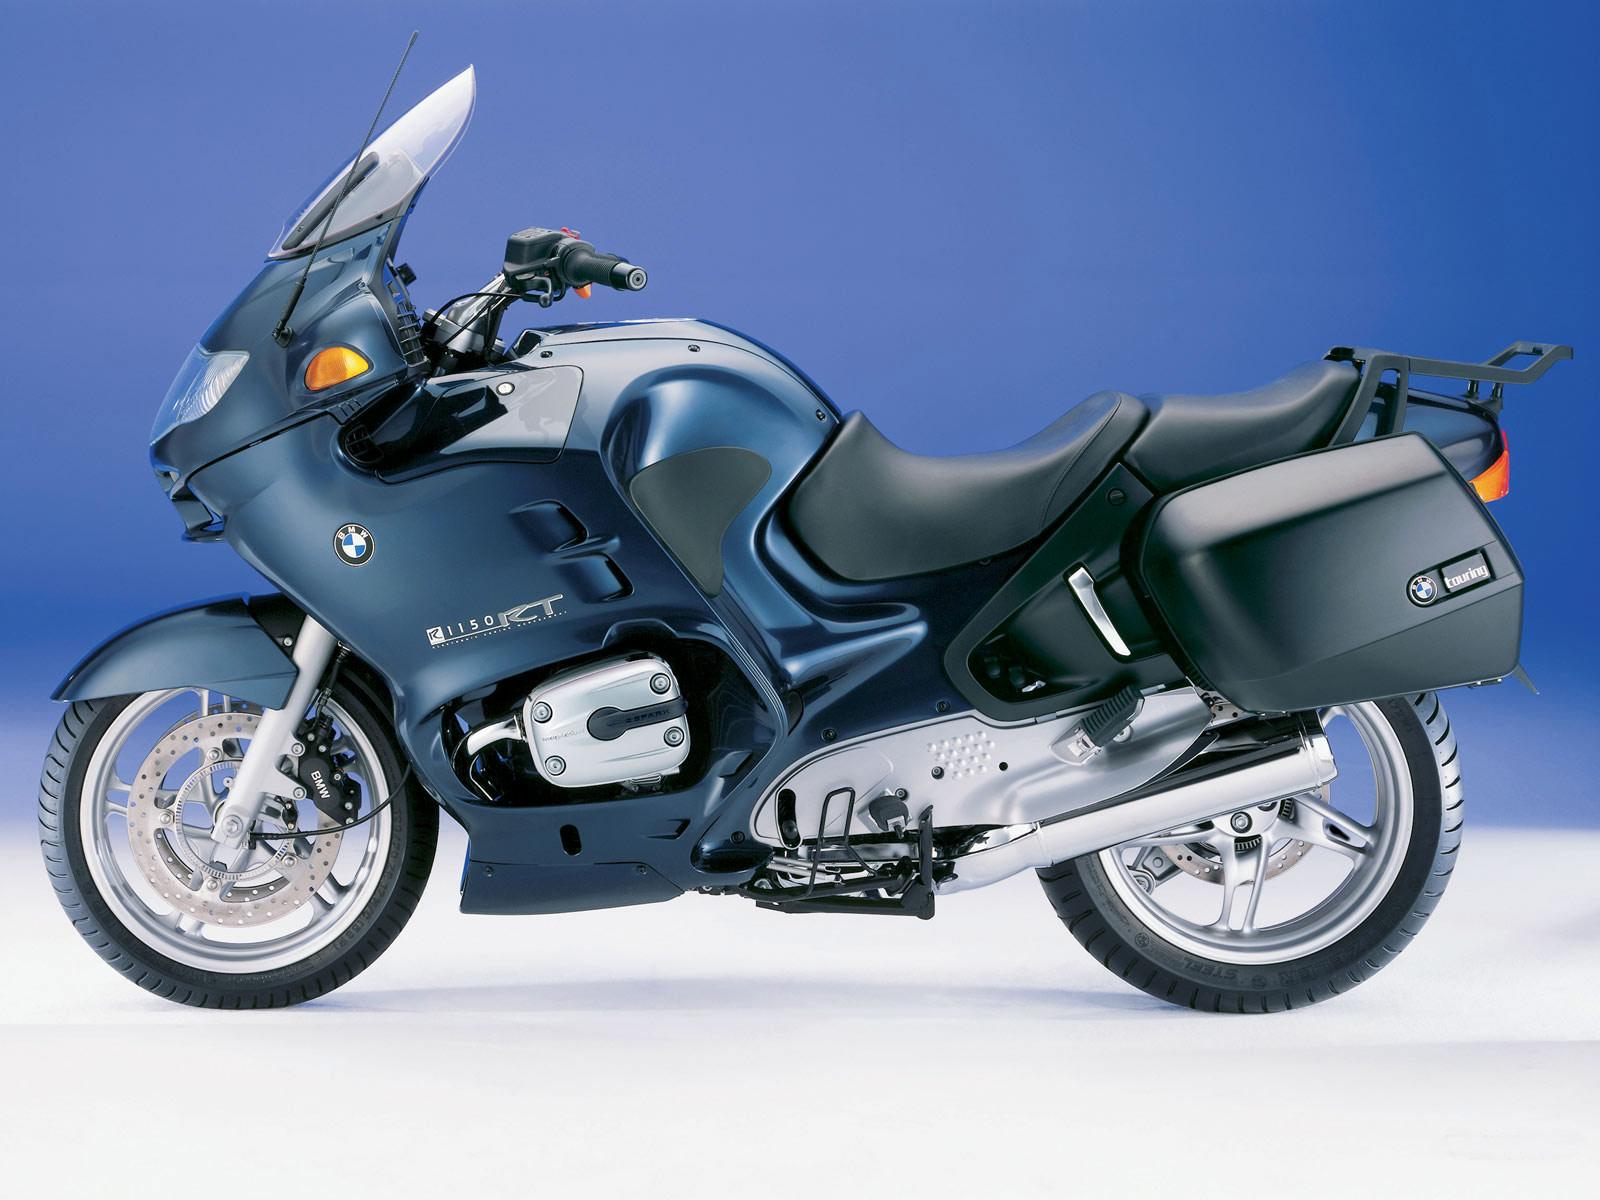 http://3.bp.blogspot.com/-_huOrMokiC4/TiOpdWpW-uI/AAAAAAAAAf8/Y3UGQO01Bfs/s1600/BMW-desktop-wallpapers_2004_R1150RT_motorcycle_1.jpg